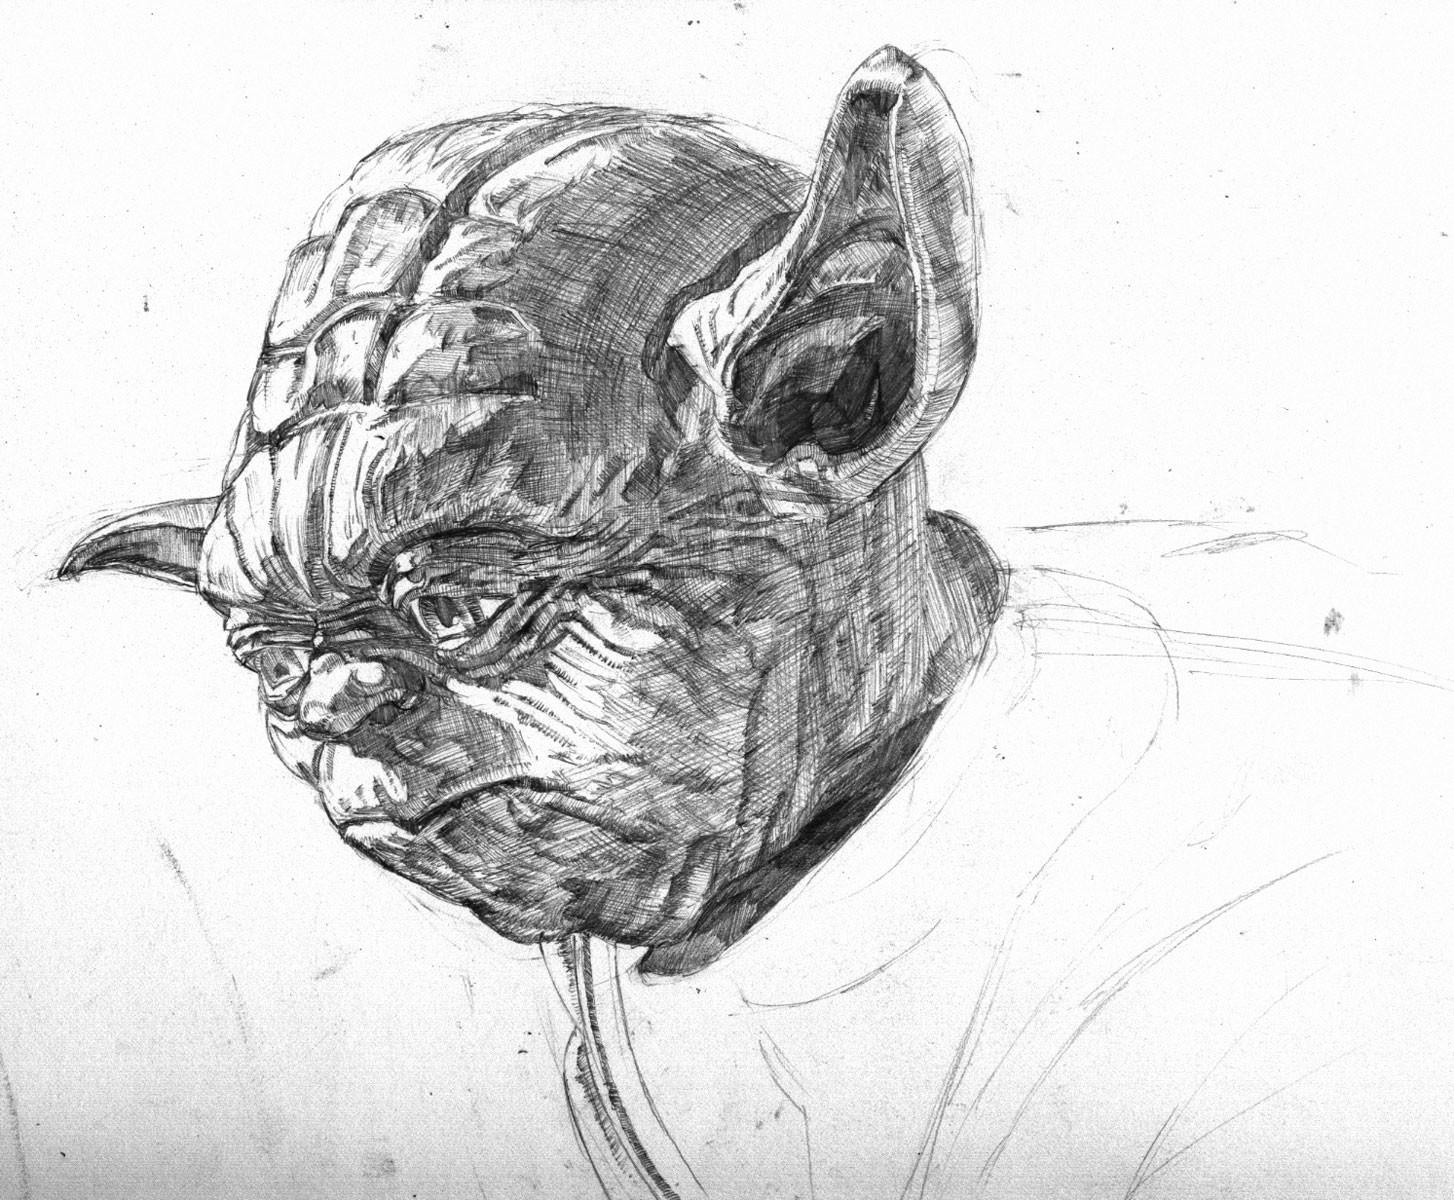 Tight pencil drawing in-progress